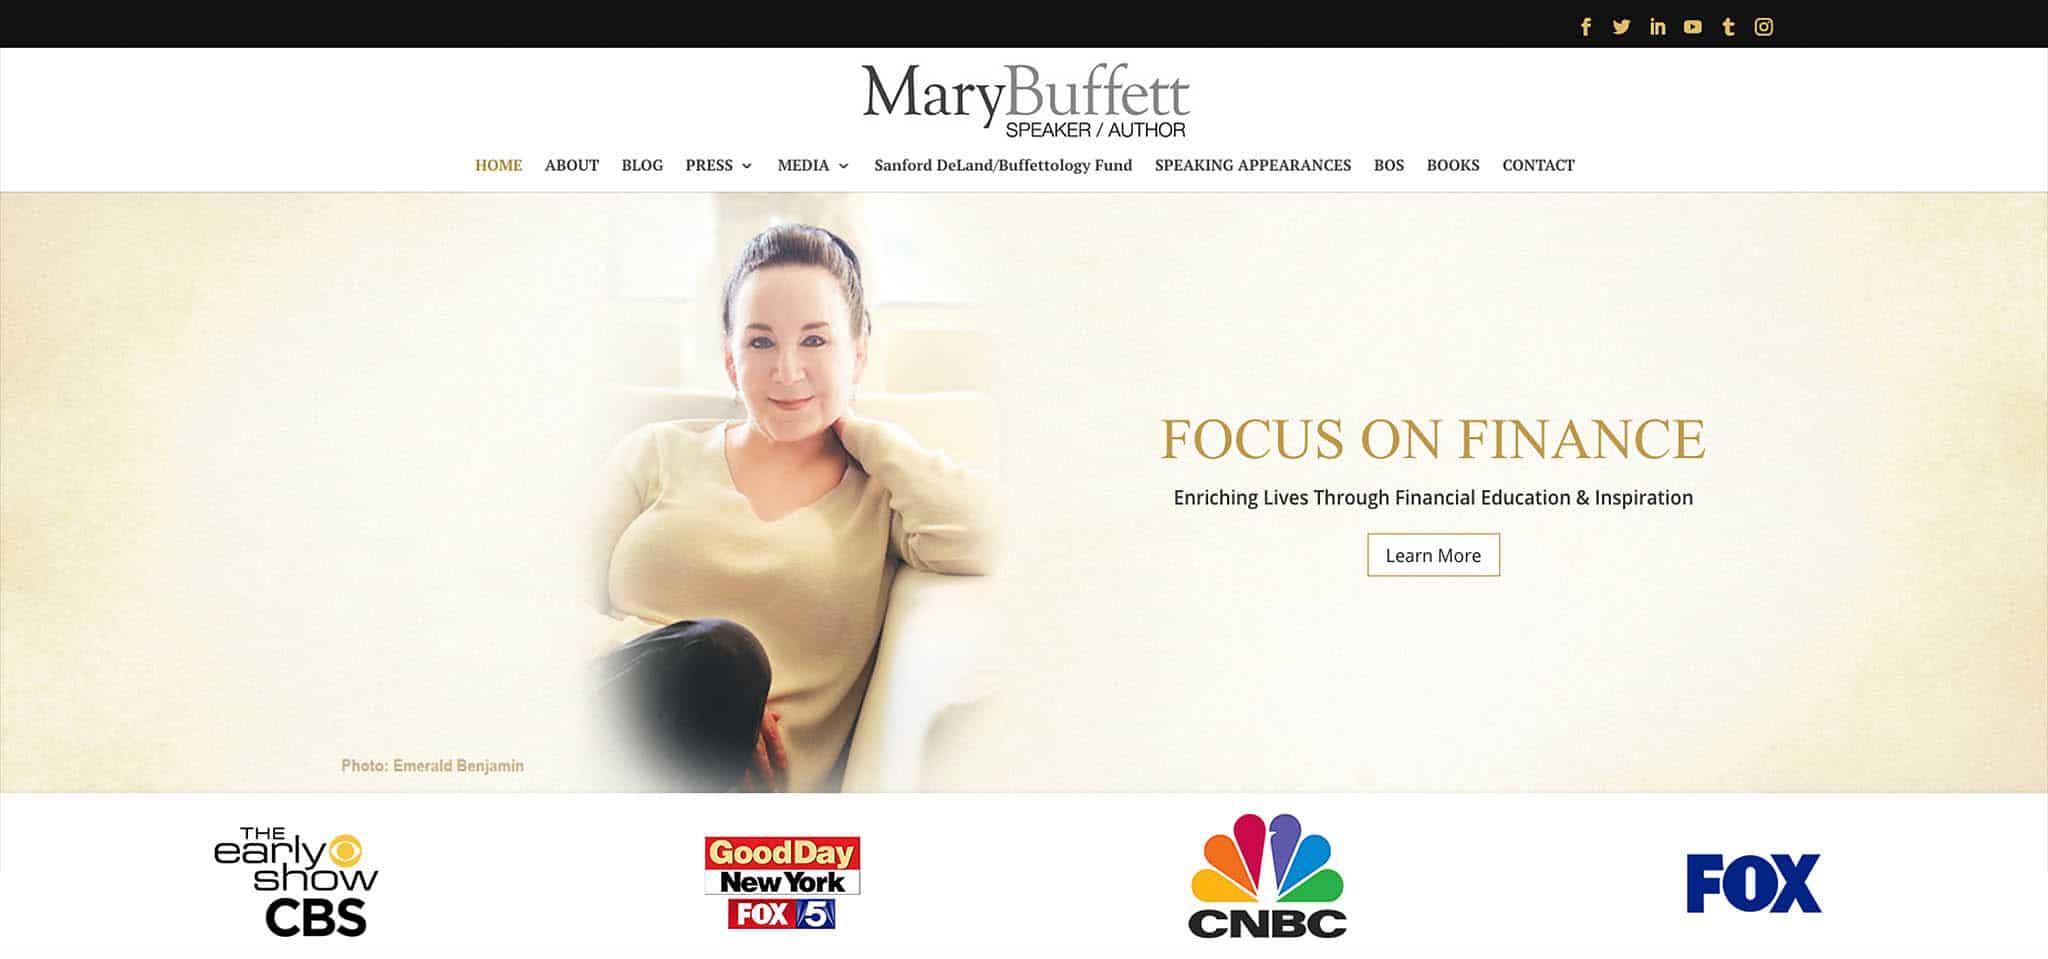 Mary Buffett worlds best selling author on Warren Buffett birkshire hathaway